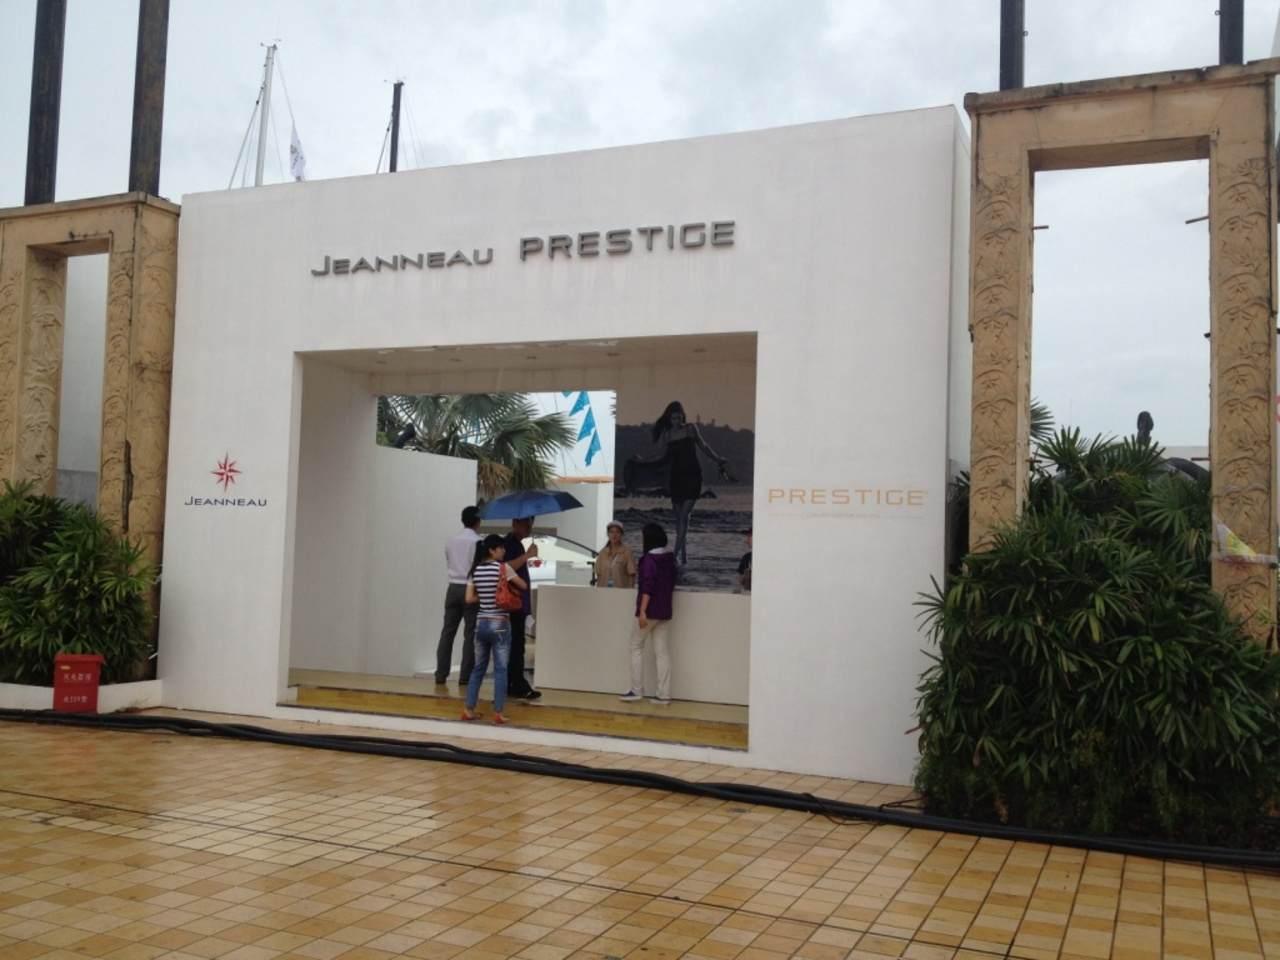 Jeanneau and Prestige in Hainan Rendez-vous boatshow 4